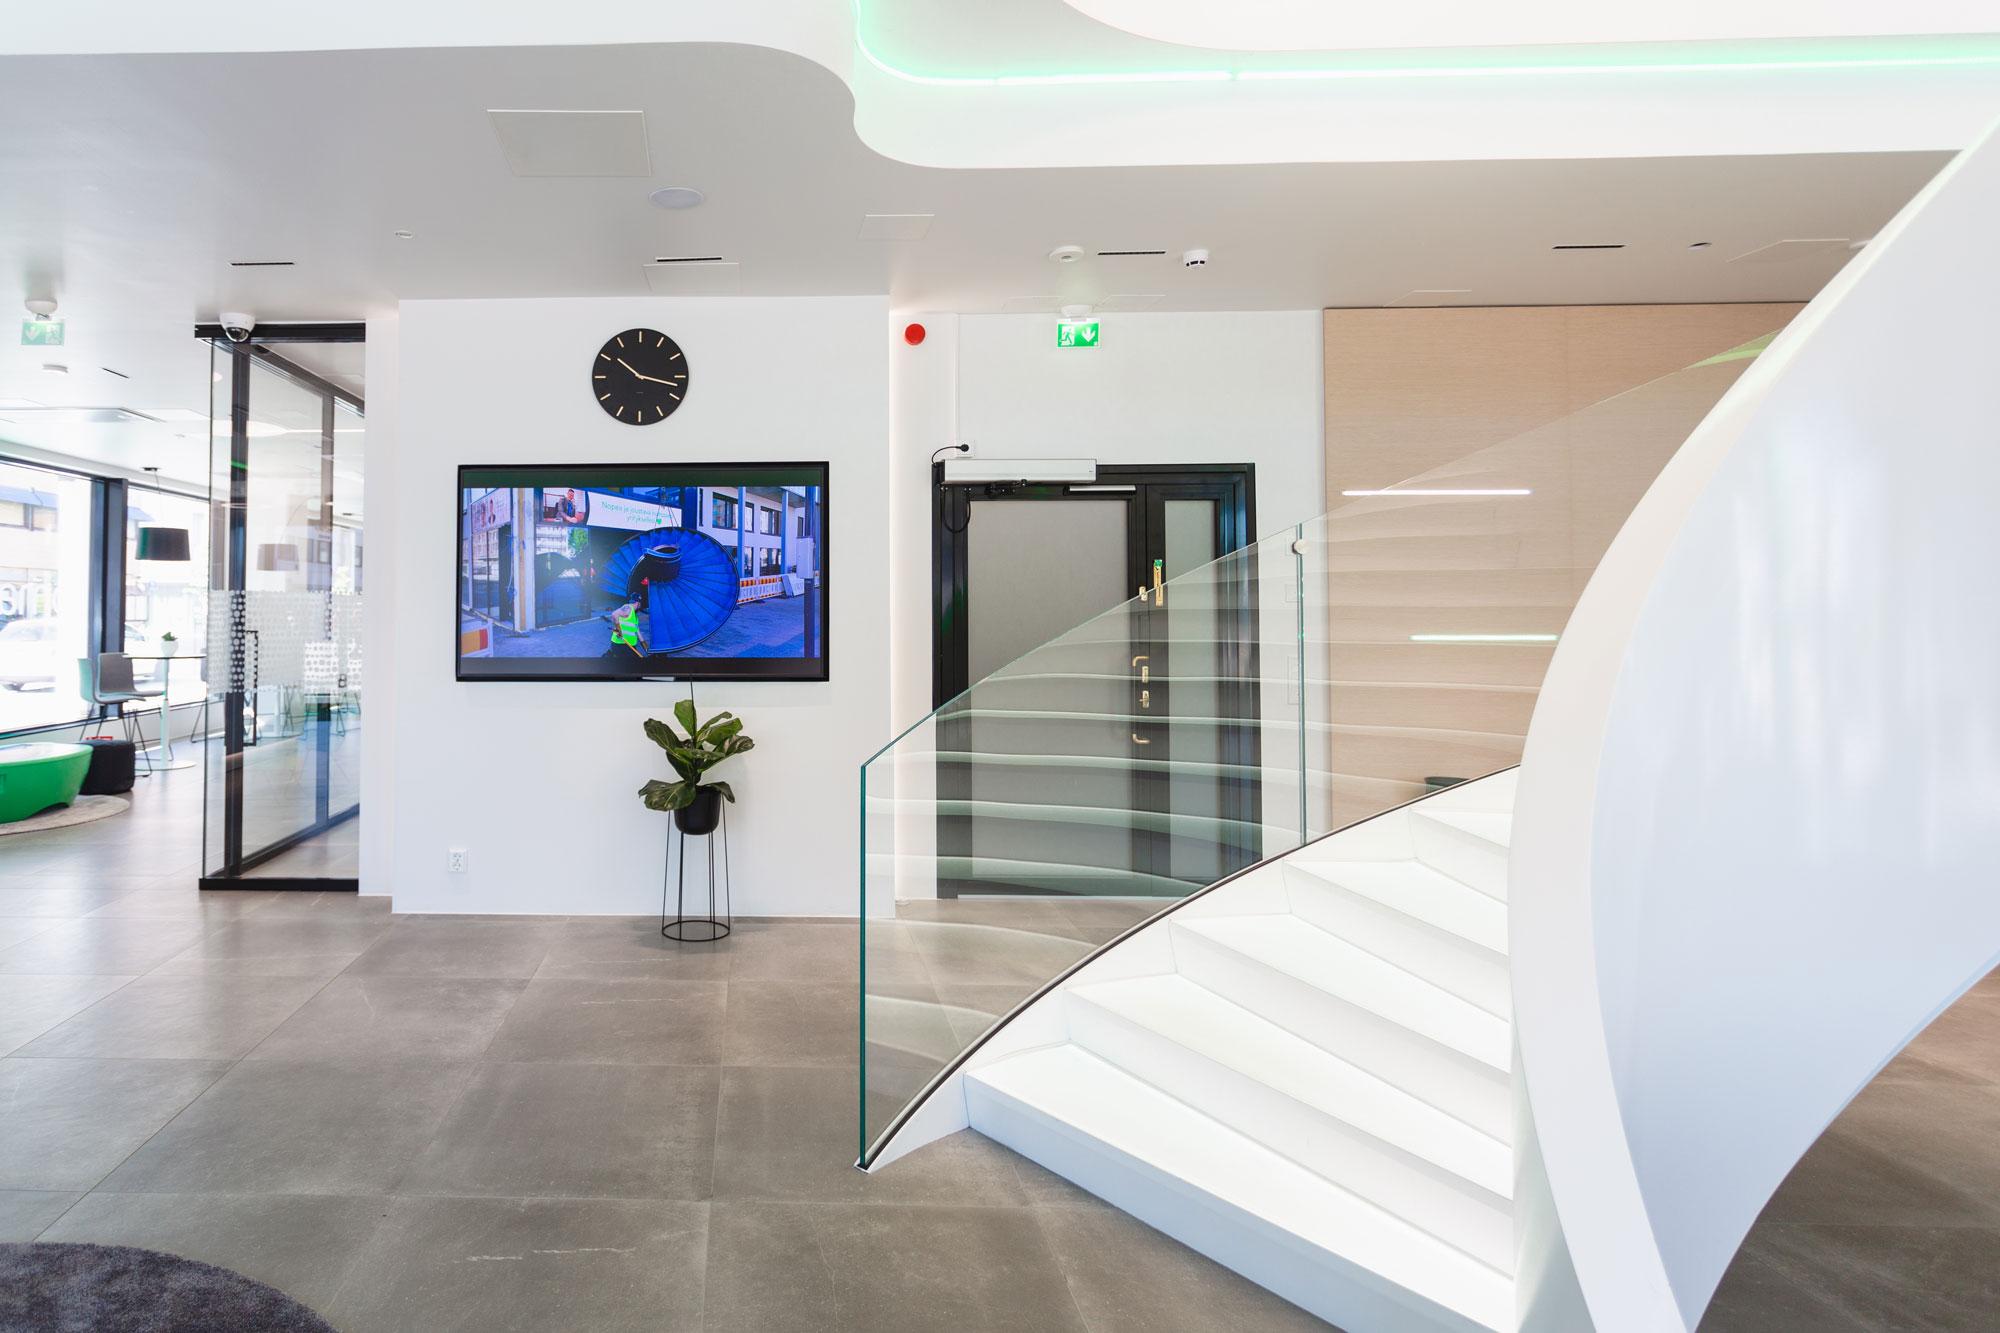 Scanmikael Office glass walls_glass balustrades_OmaSP Seinäjoki, Finland